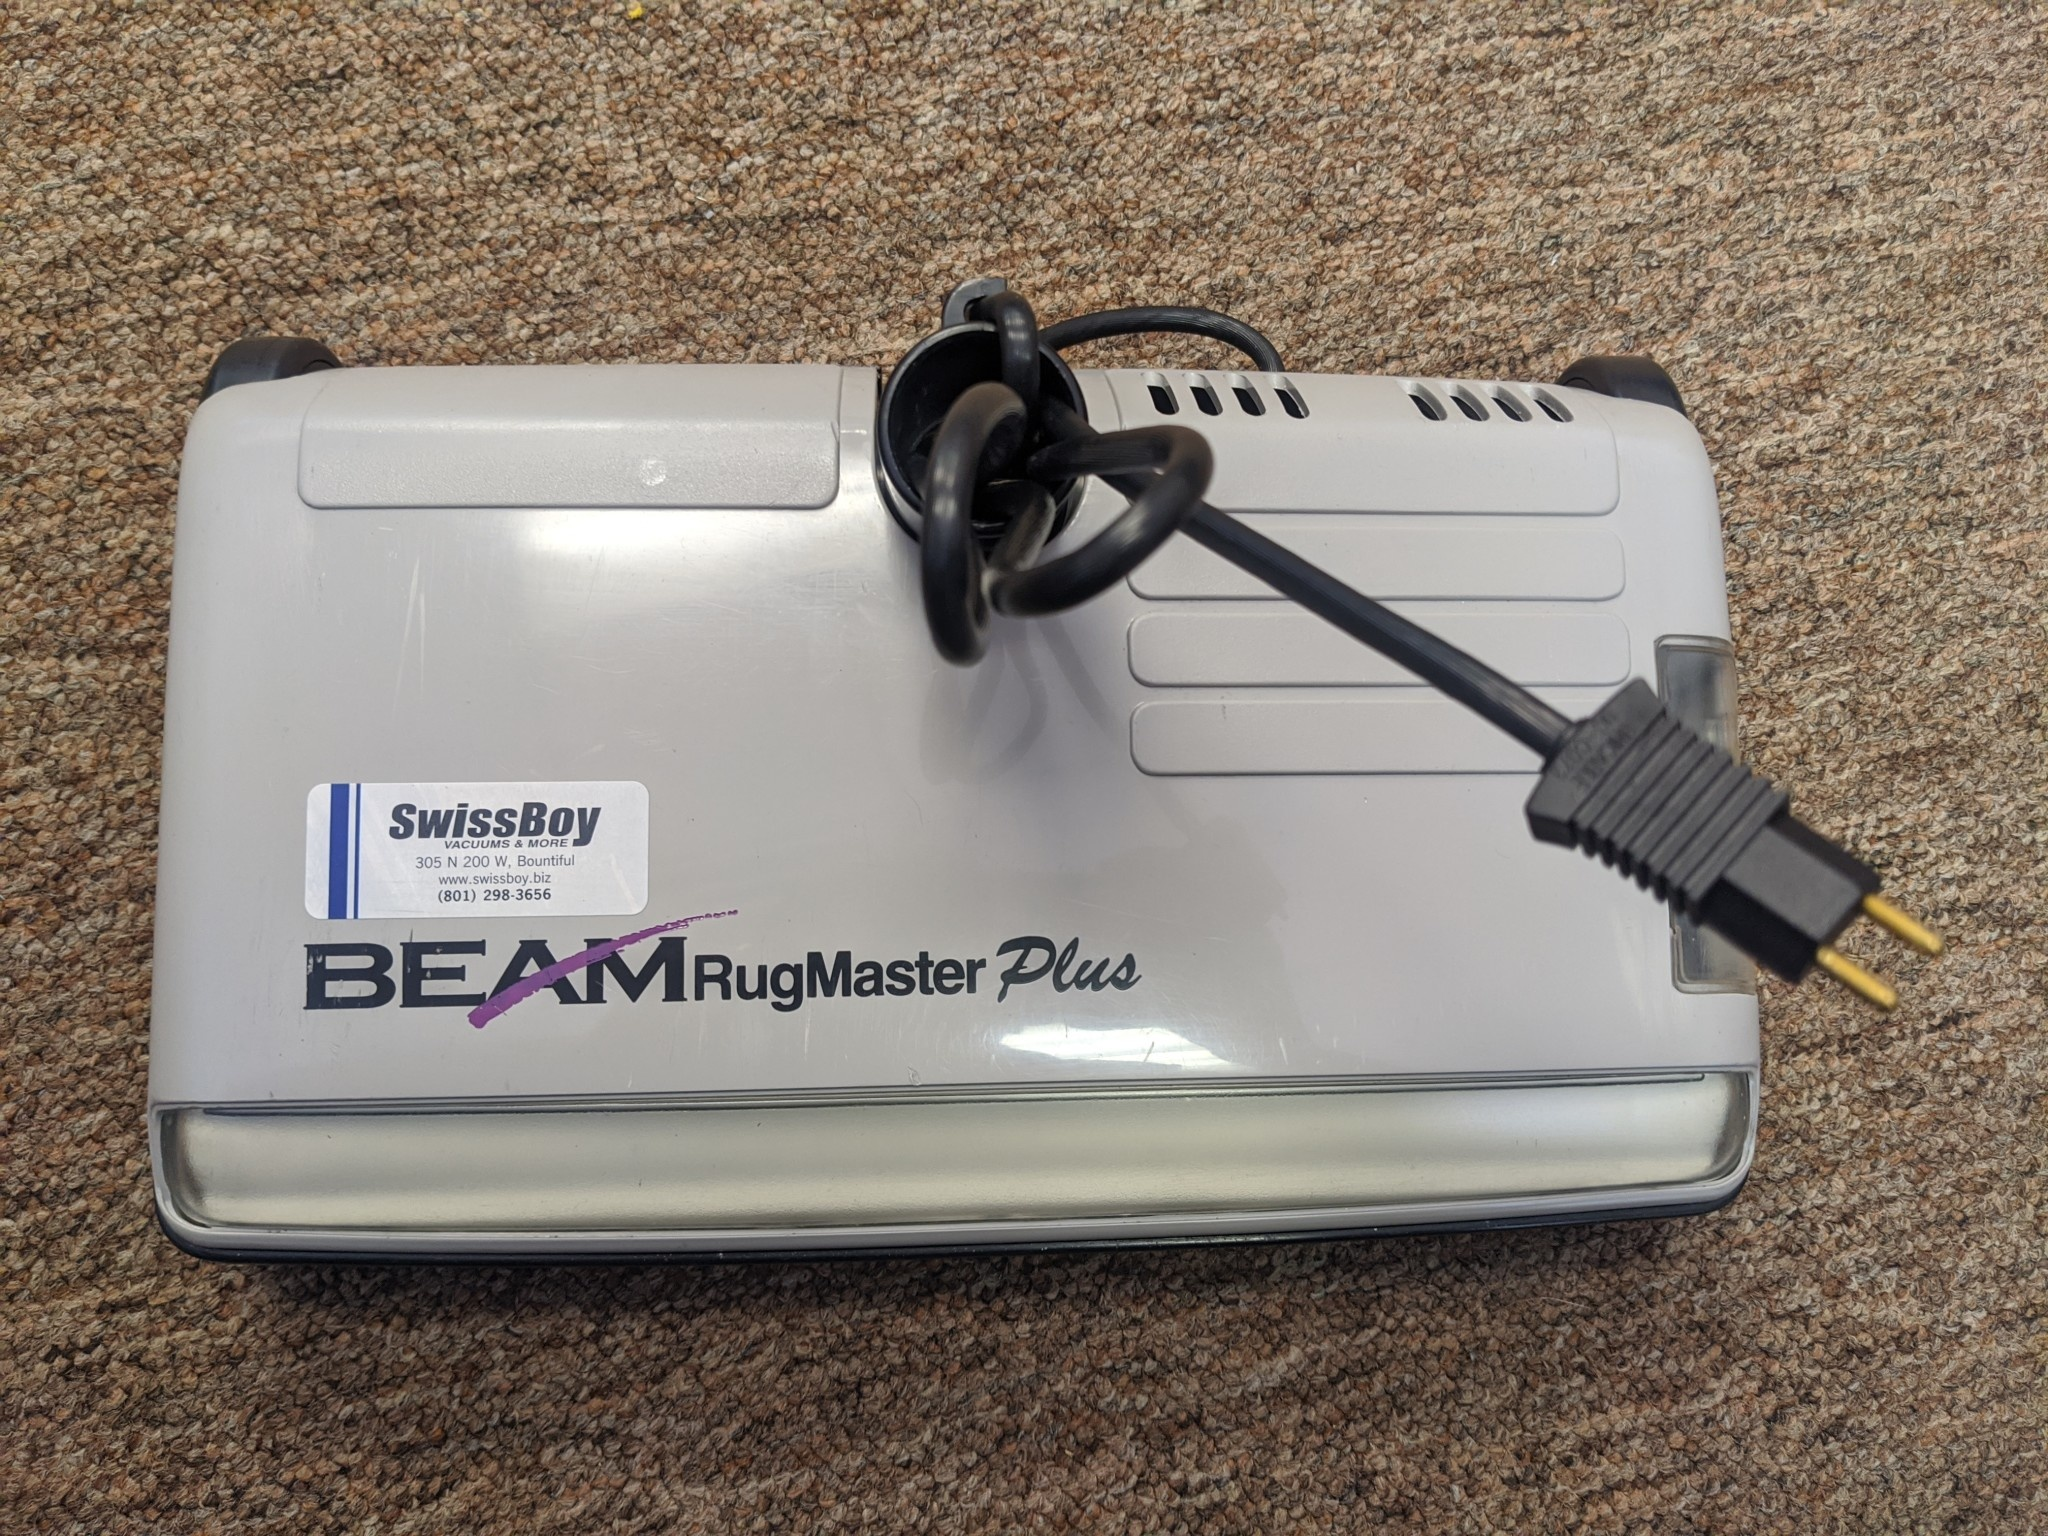 BEAM Refurbished Beam Rugmaster Plus - 3/3/20